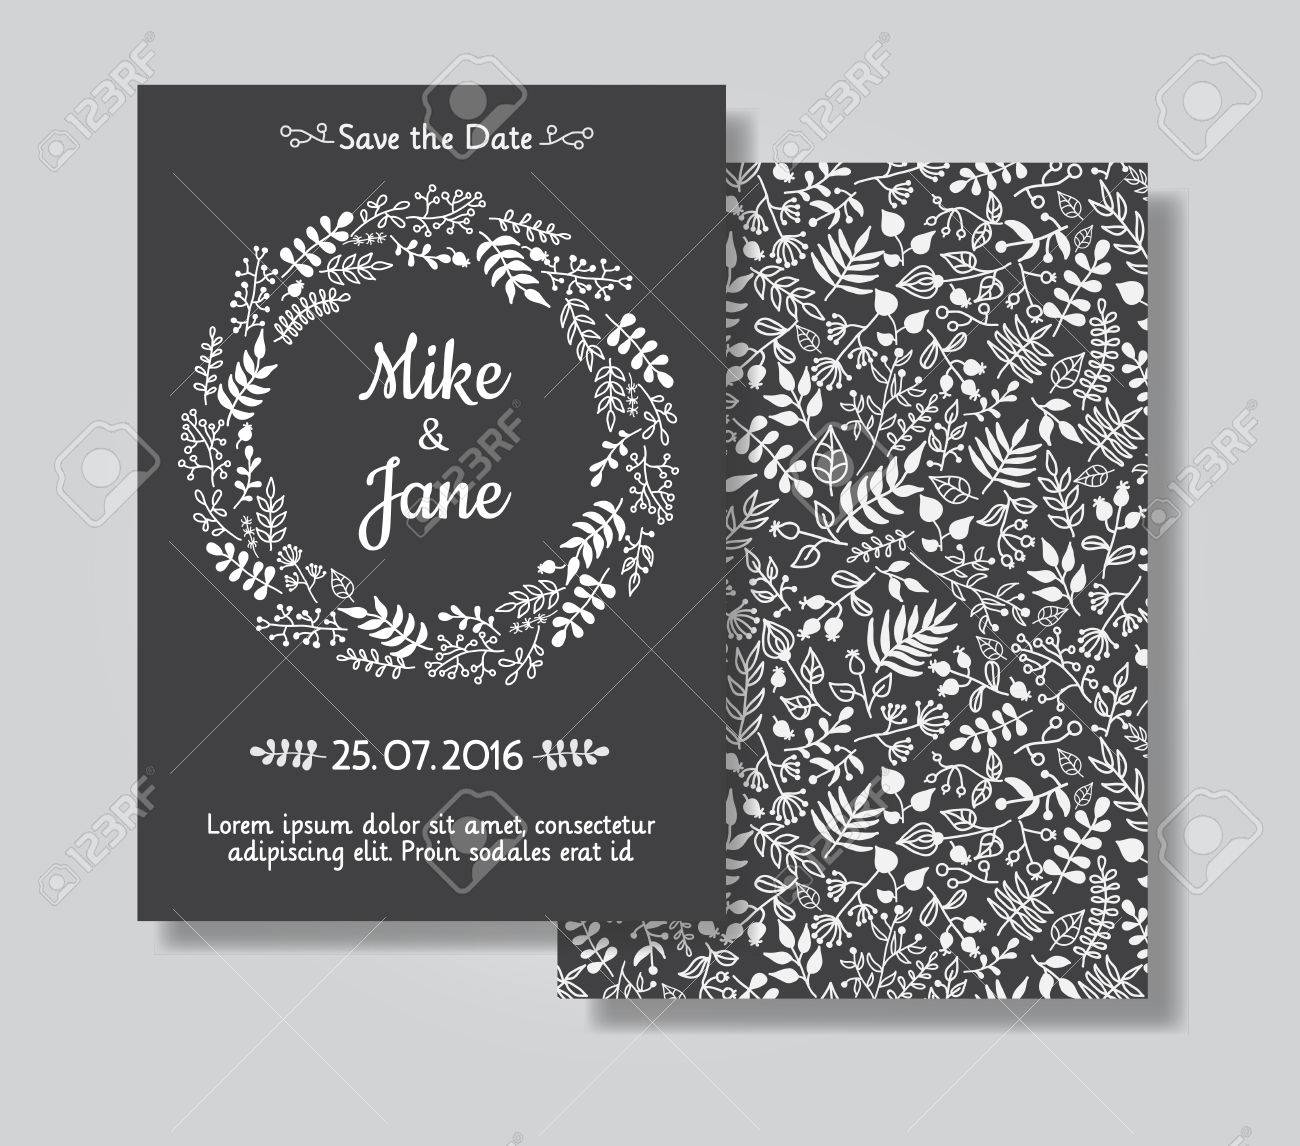 Rustic Wedding Invitation Card Set White Floral Wreath On Black – Black and White Invitation Cards